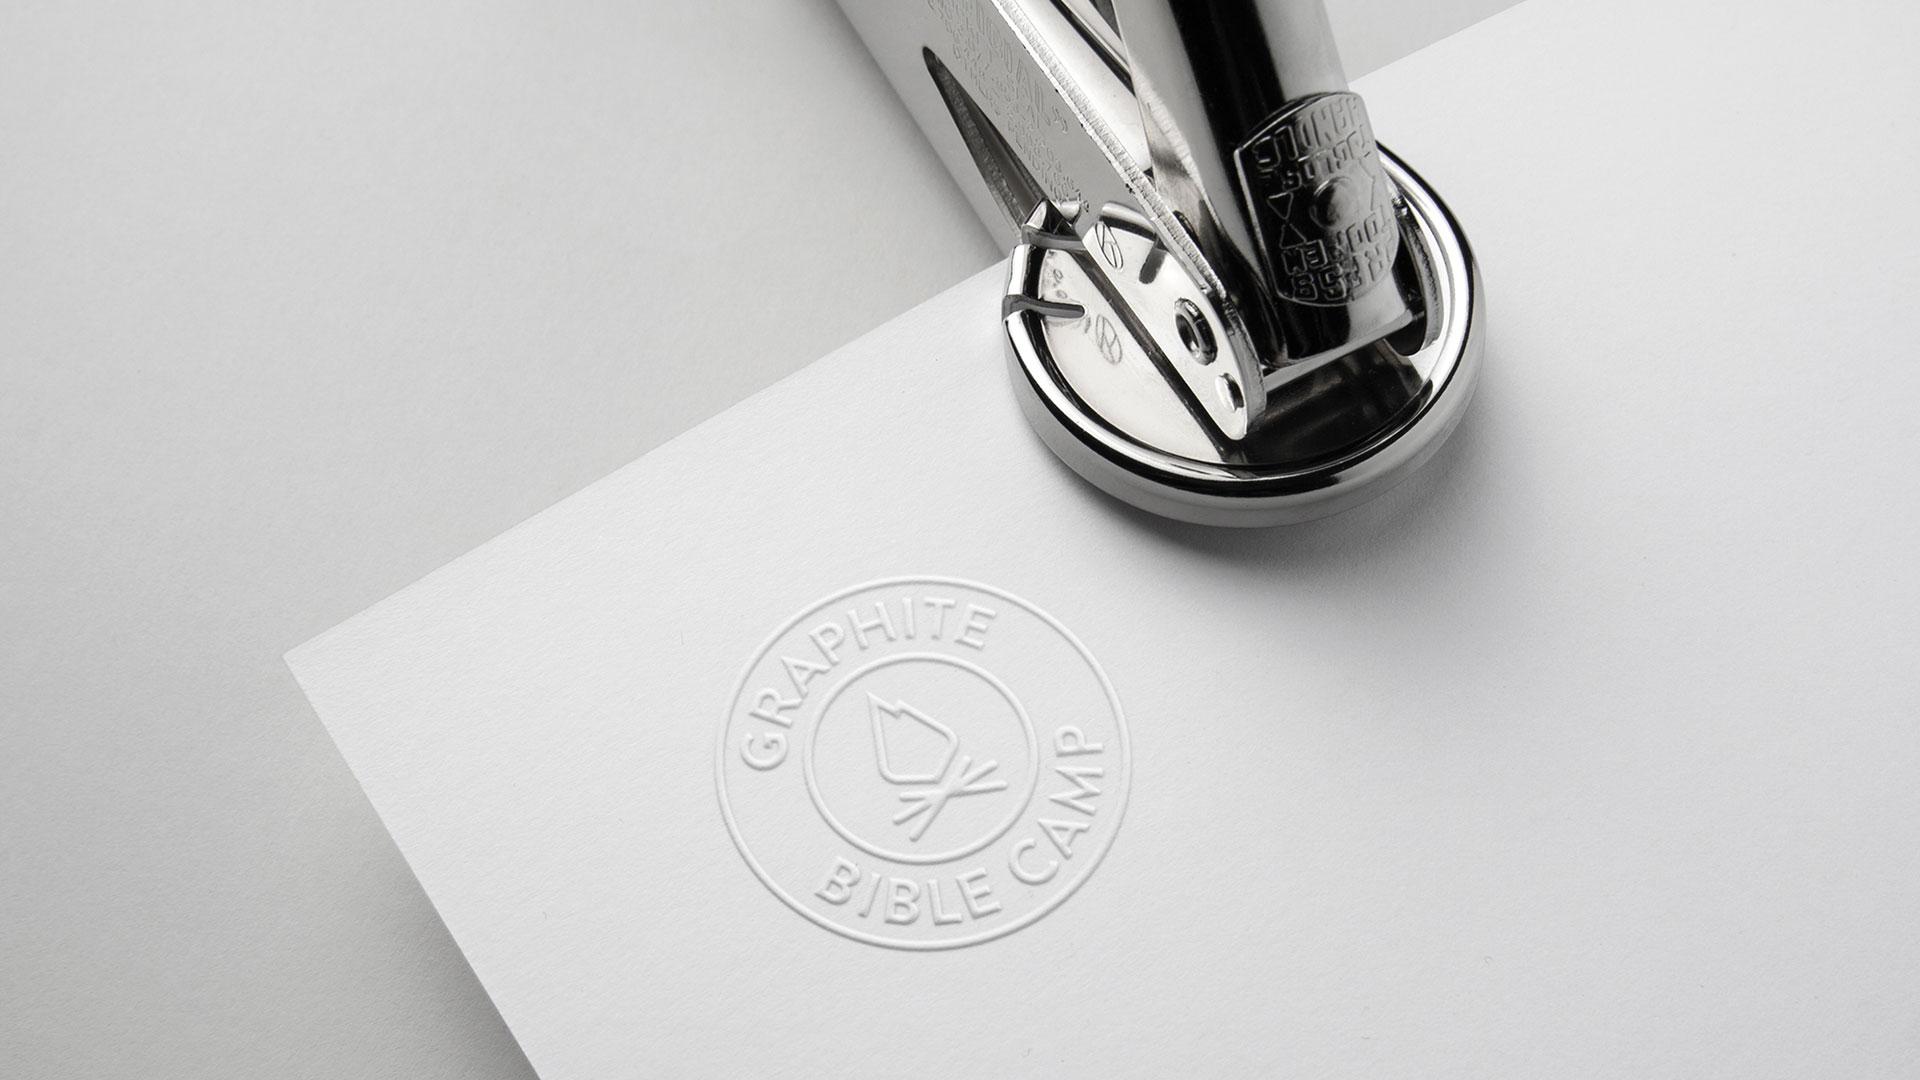 gbc-logo-embossed